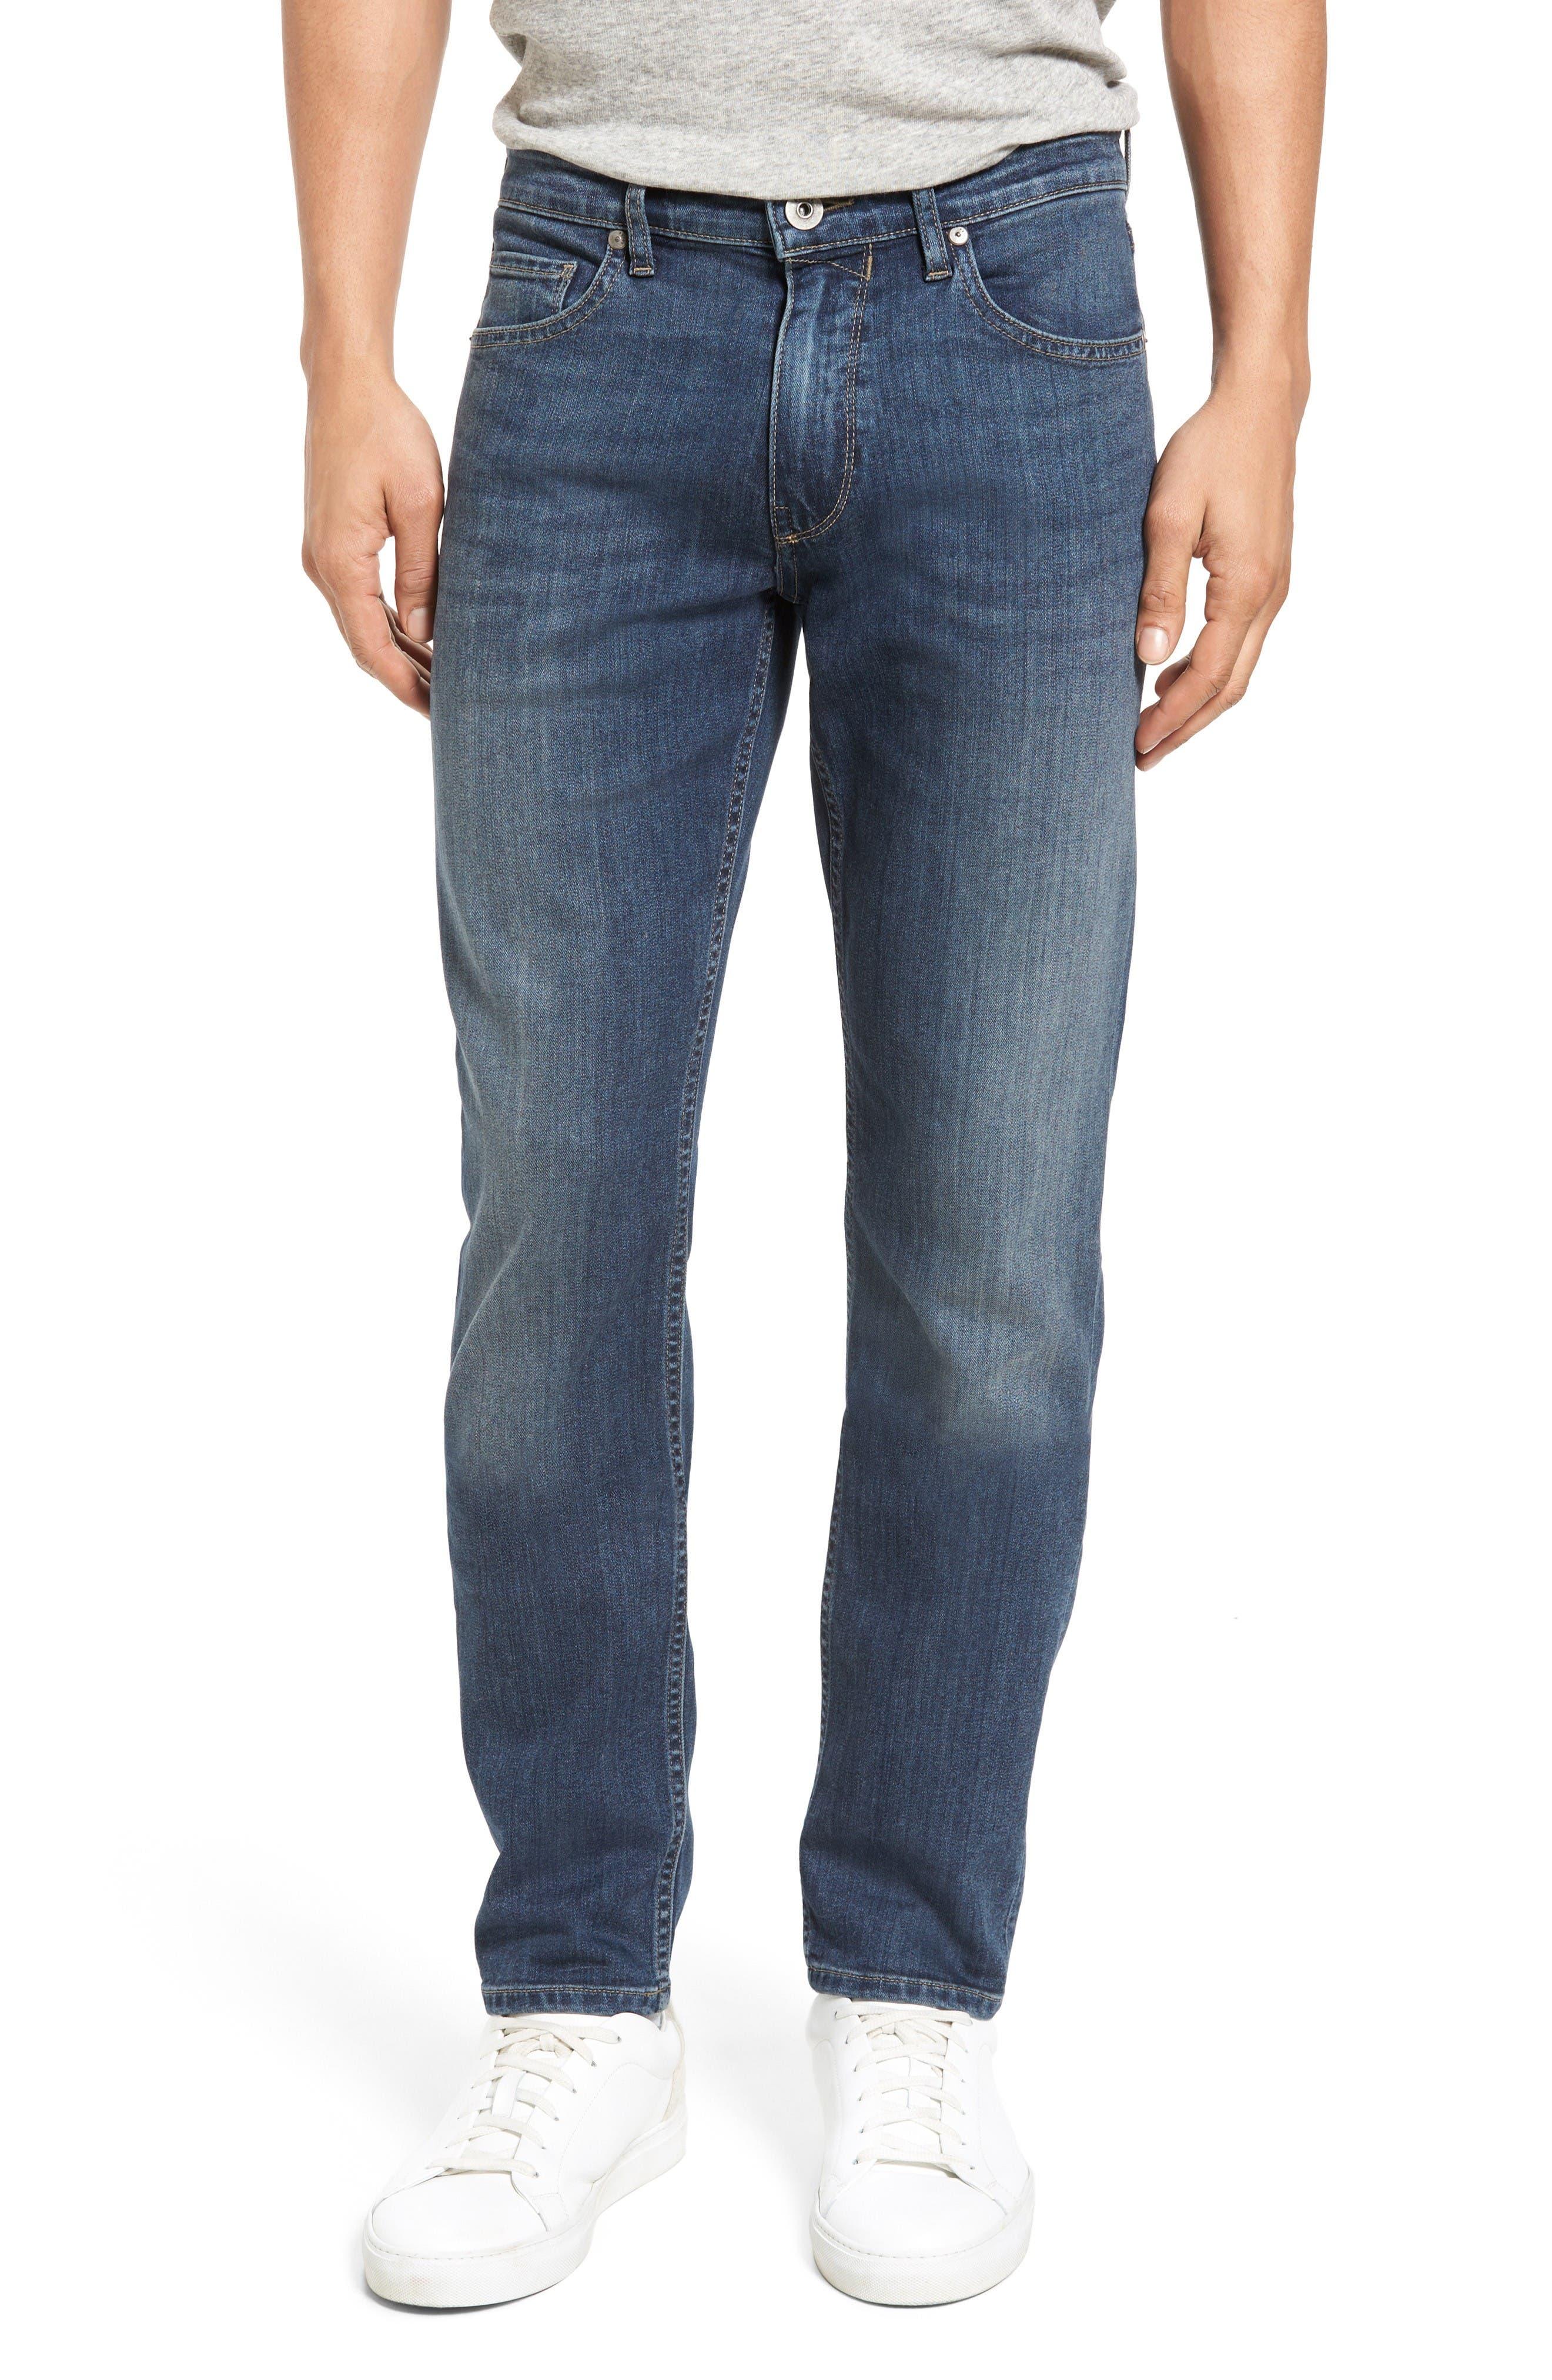 PAIGE Transcend - Lennox Slim Fit Jeans (Elwood)